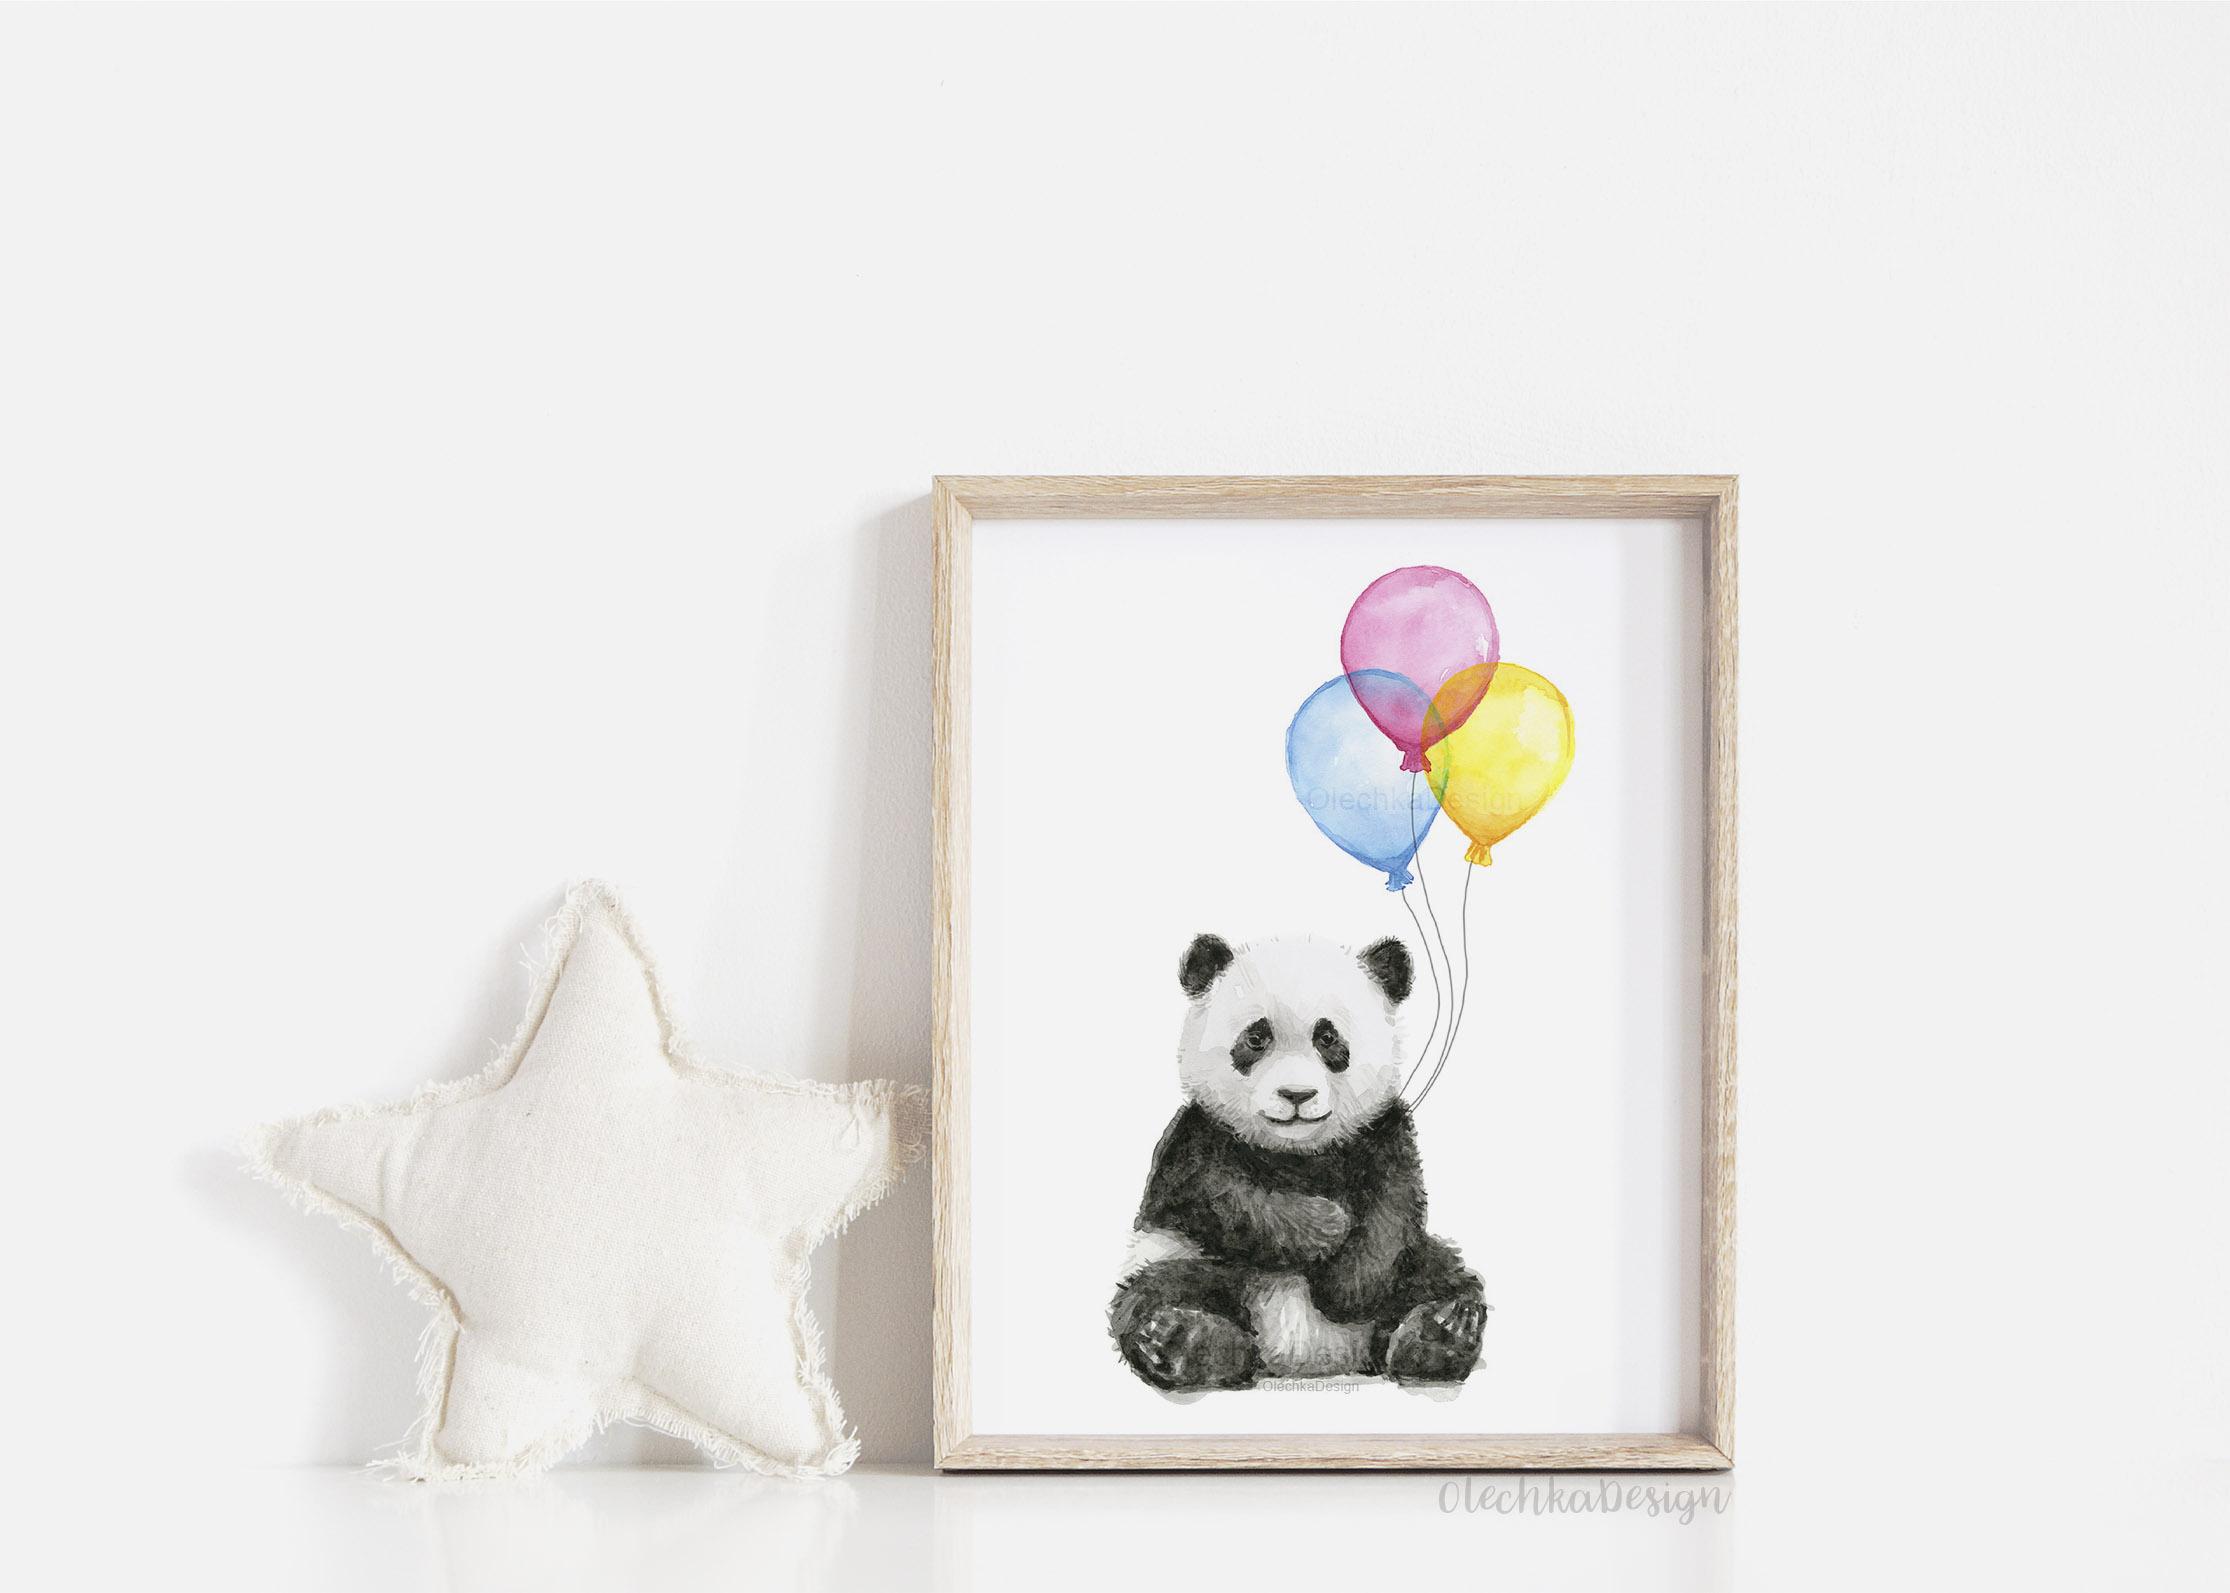 Panda-with-balloons-art.jpg